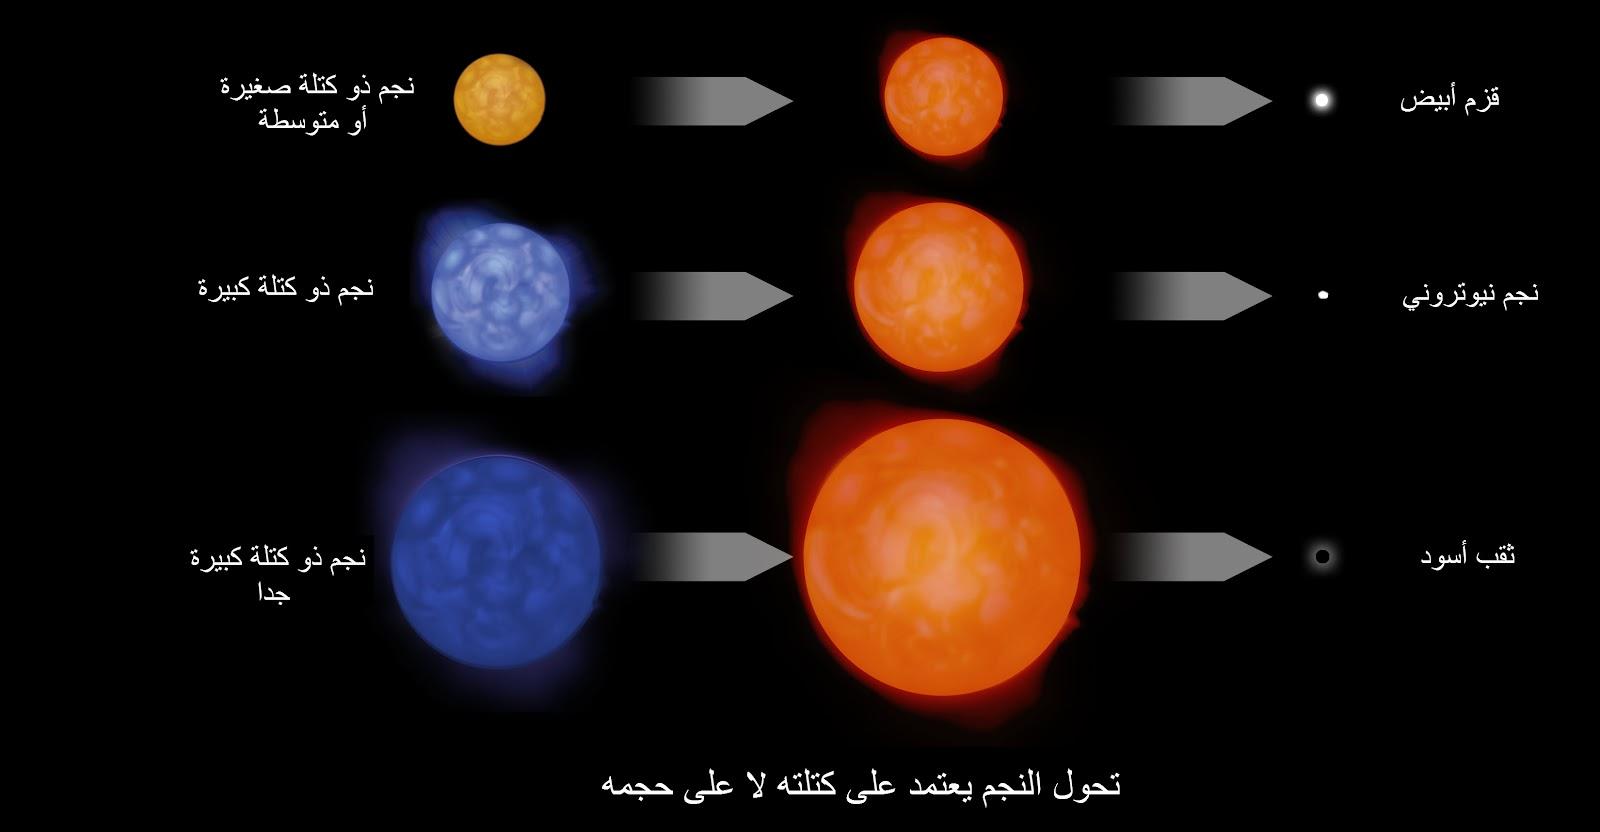 stellar_fate2_300dpi.jpg